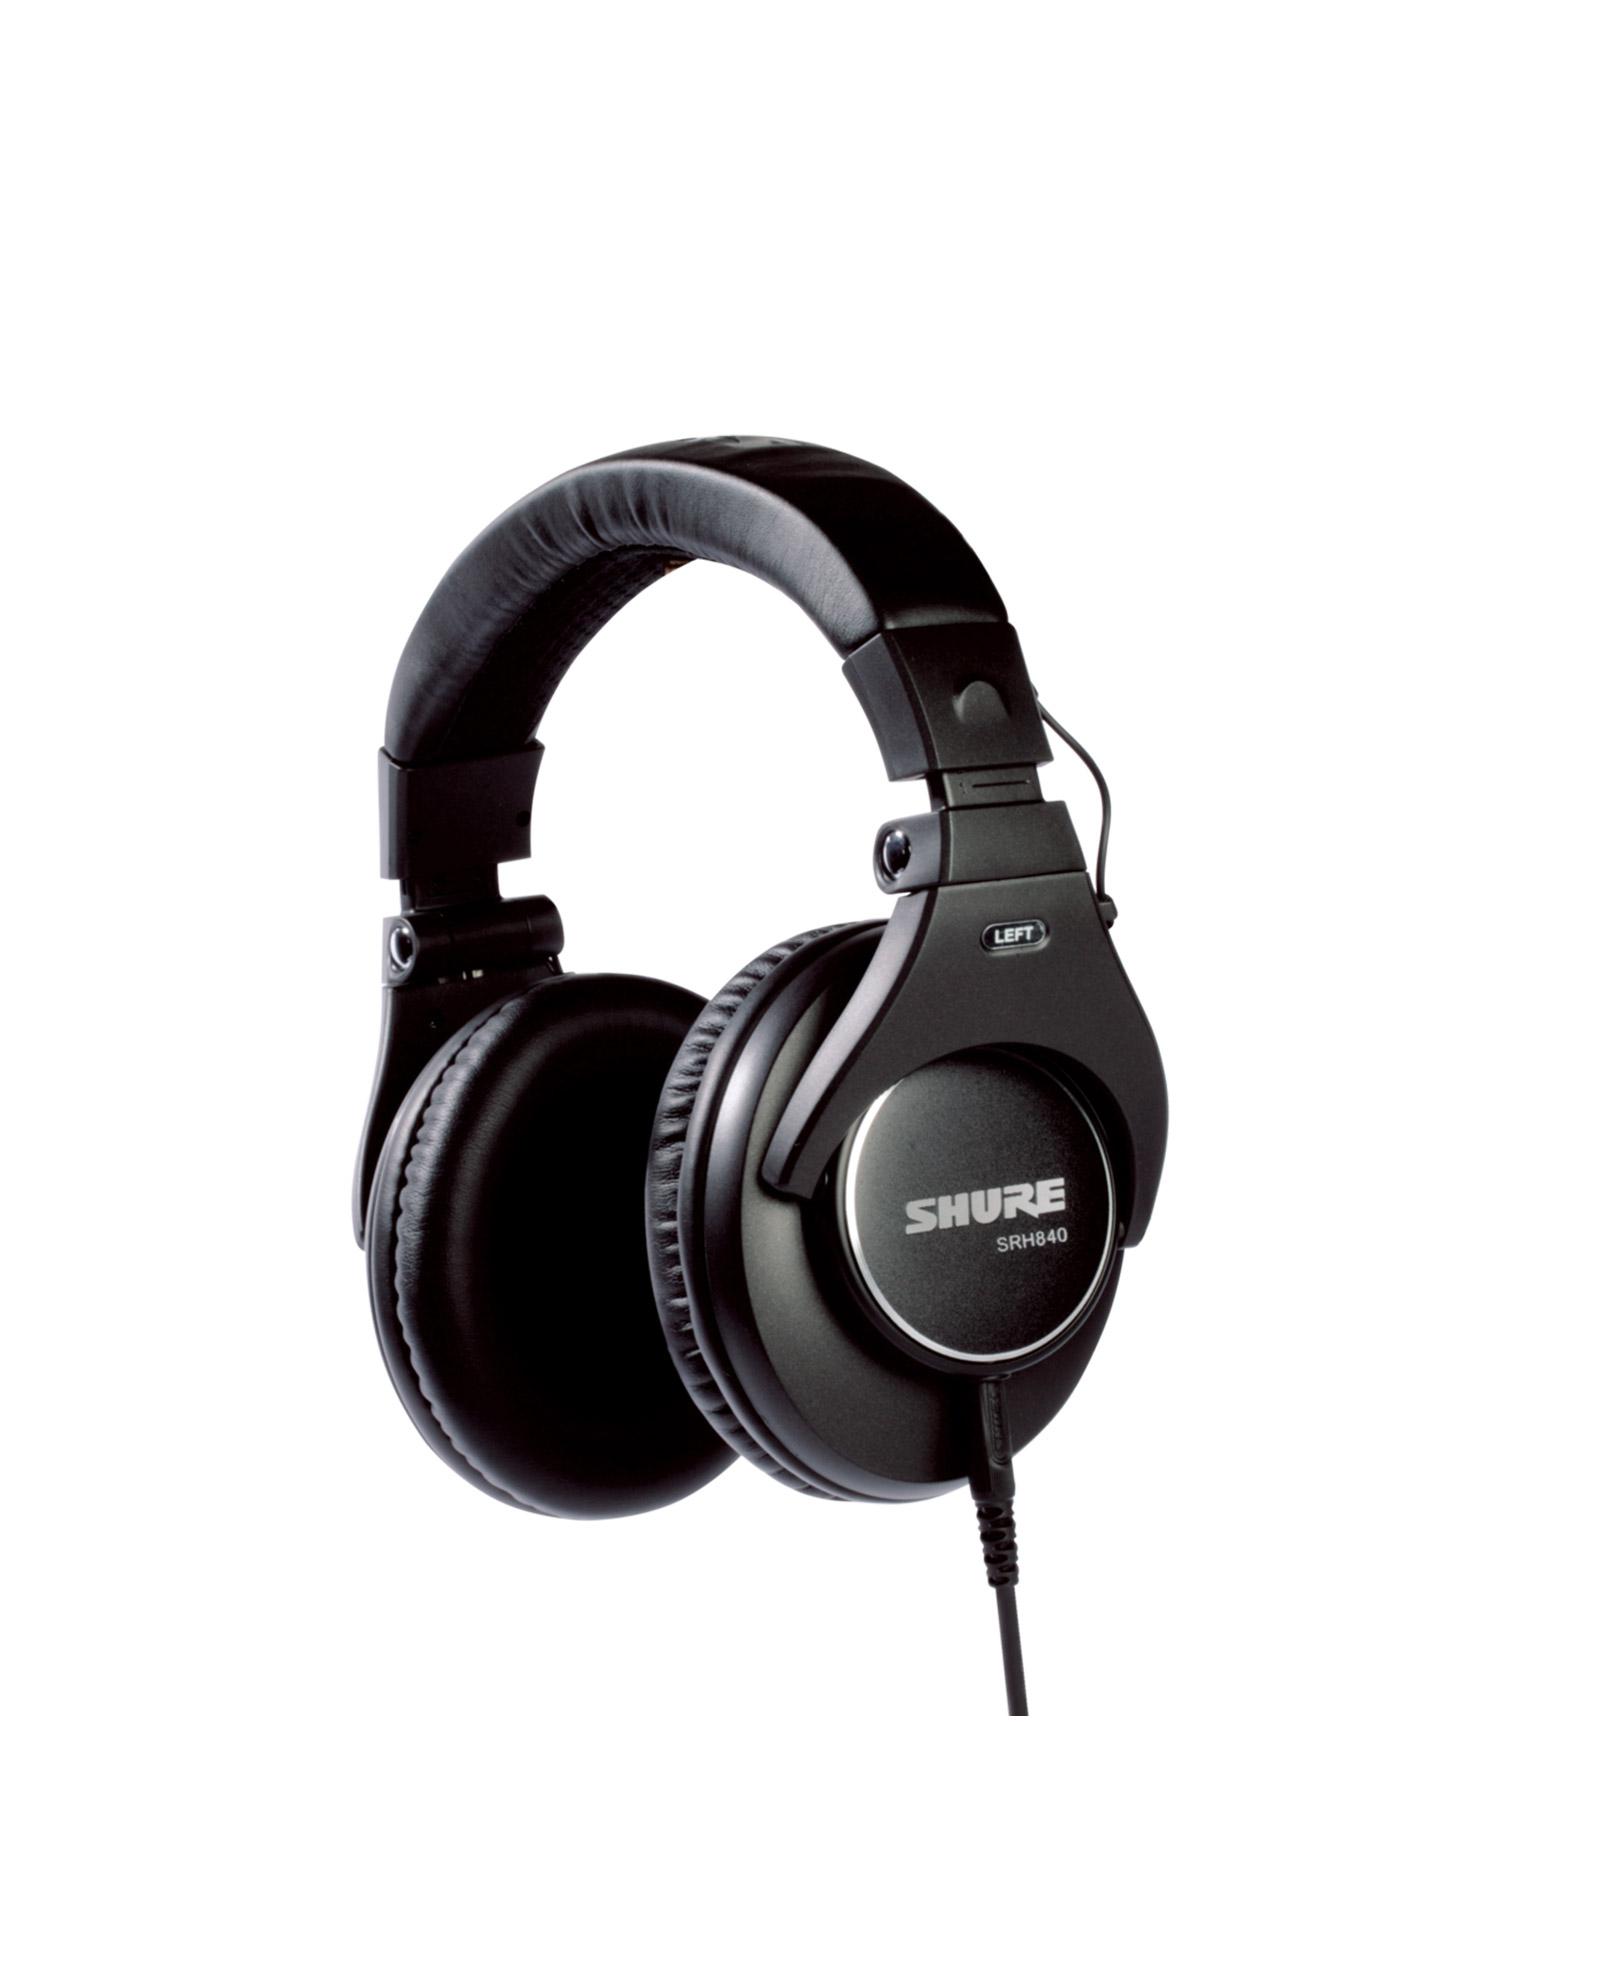 Shure Srh840 Professional Monitoring Headphones 3jpg